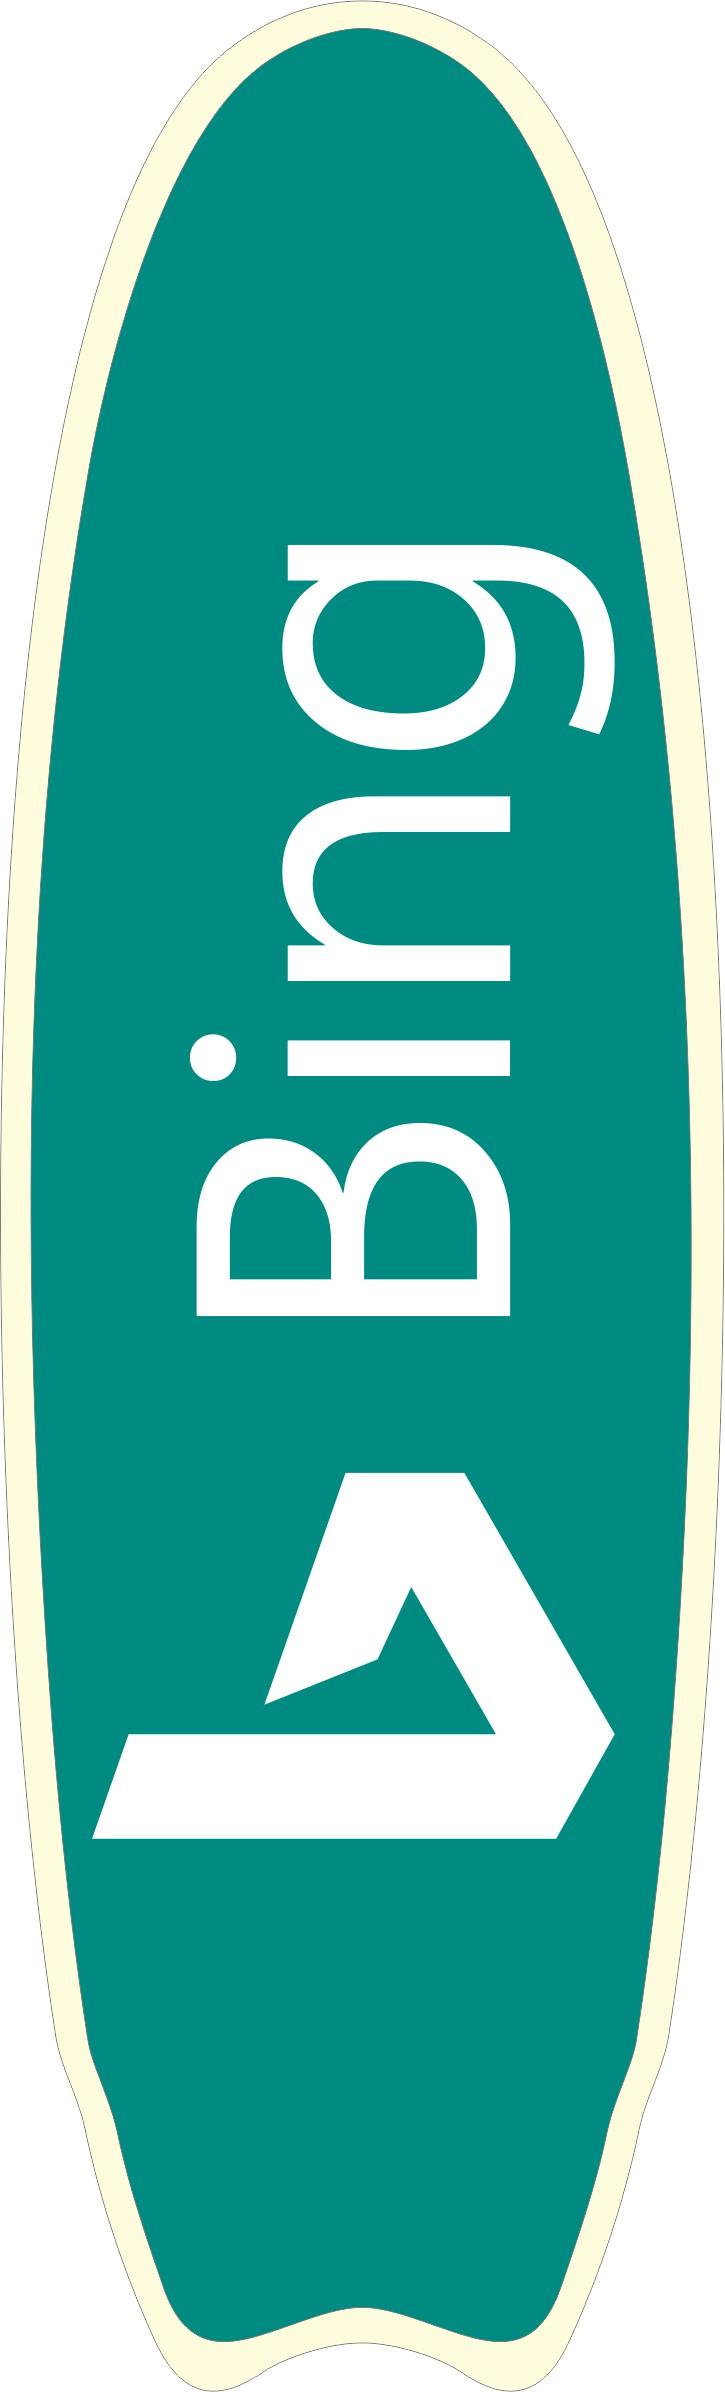 Bing Soft Top Surfboard.jpg